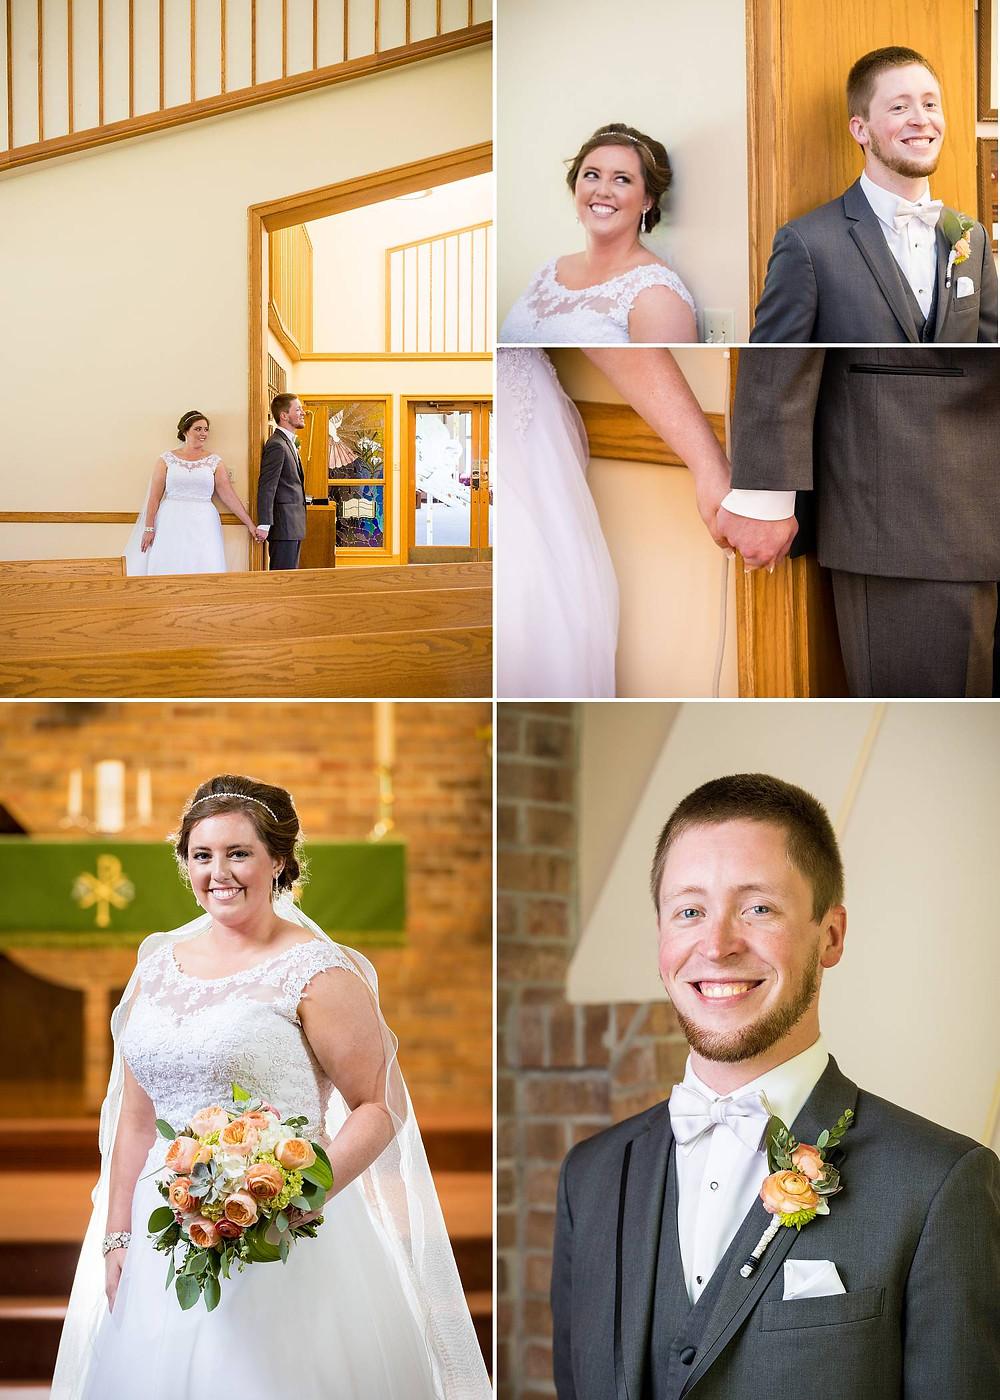 Oshkosh Wisconsin Wedding First Look   Lanari Photography